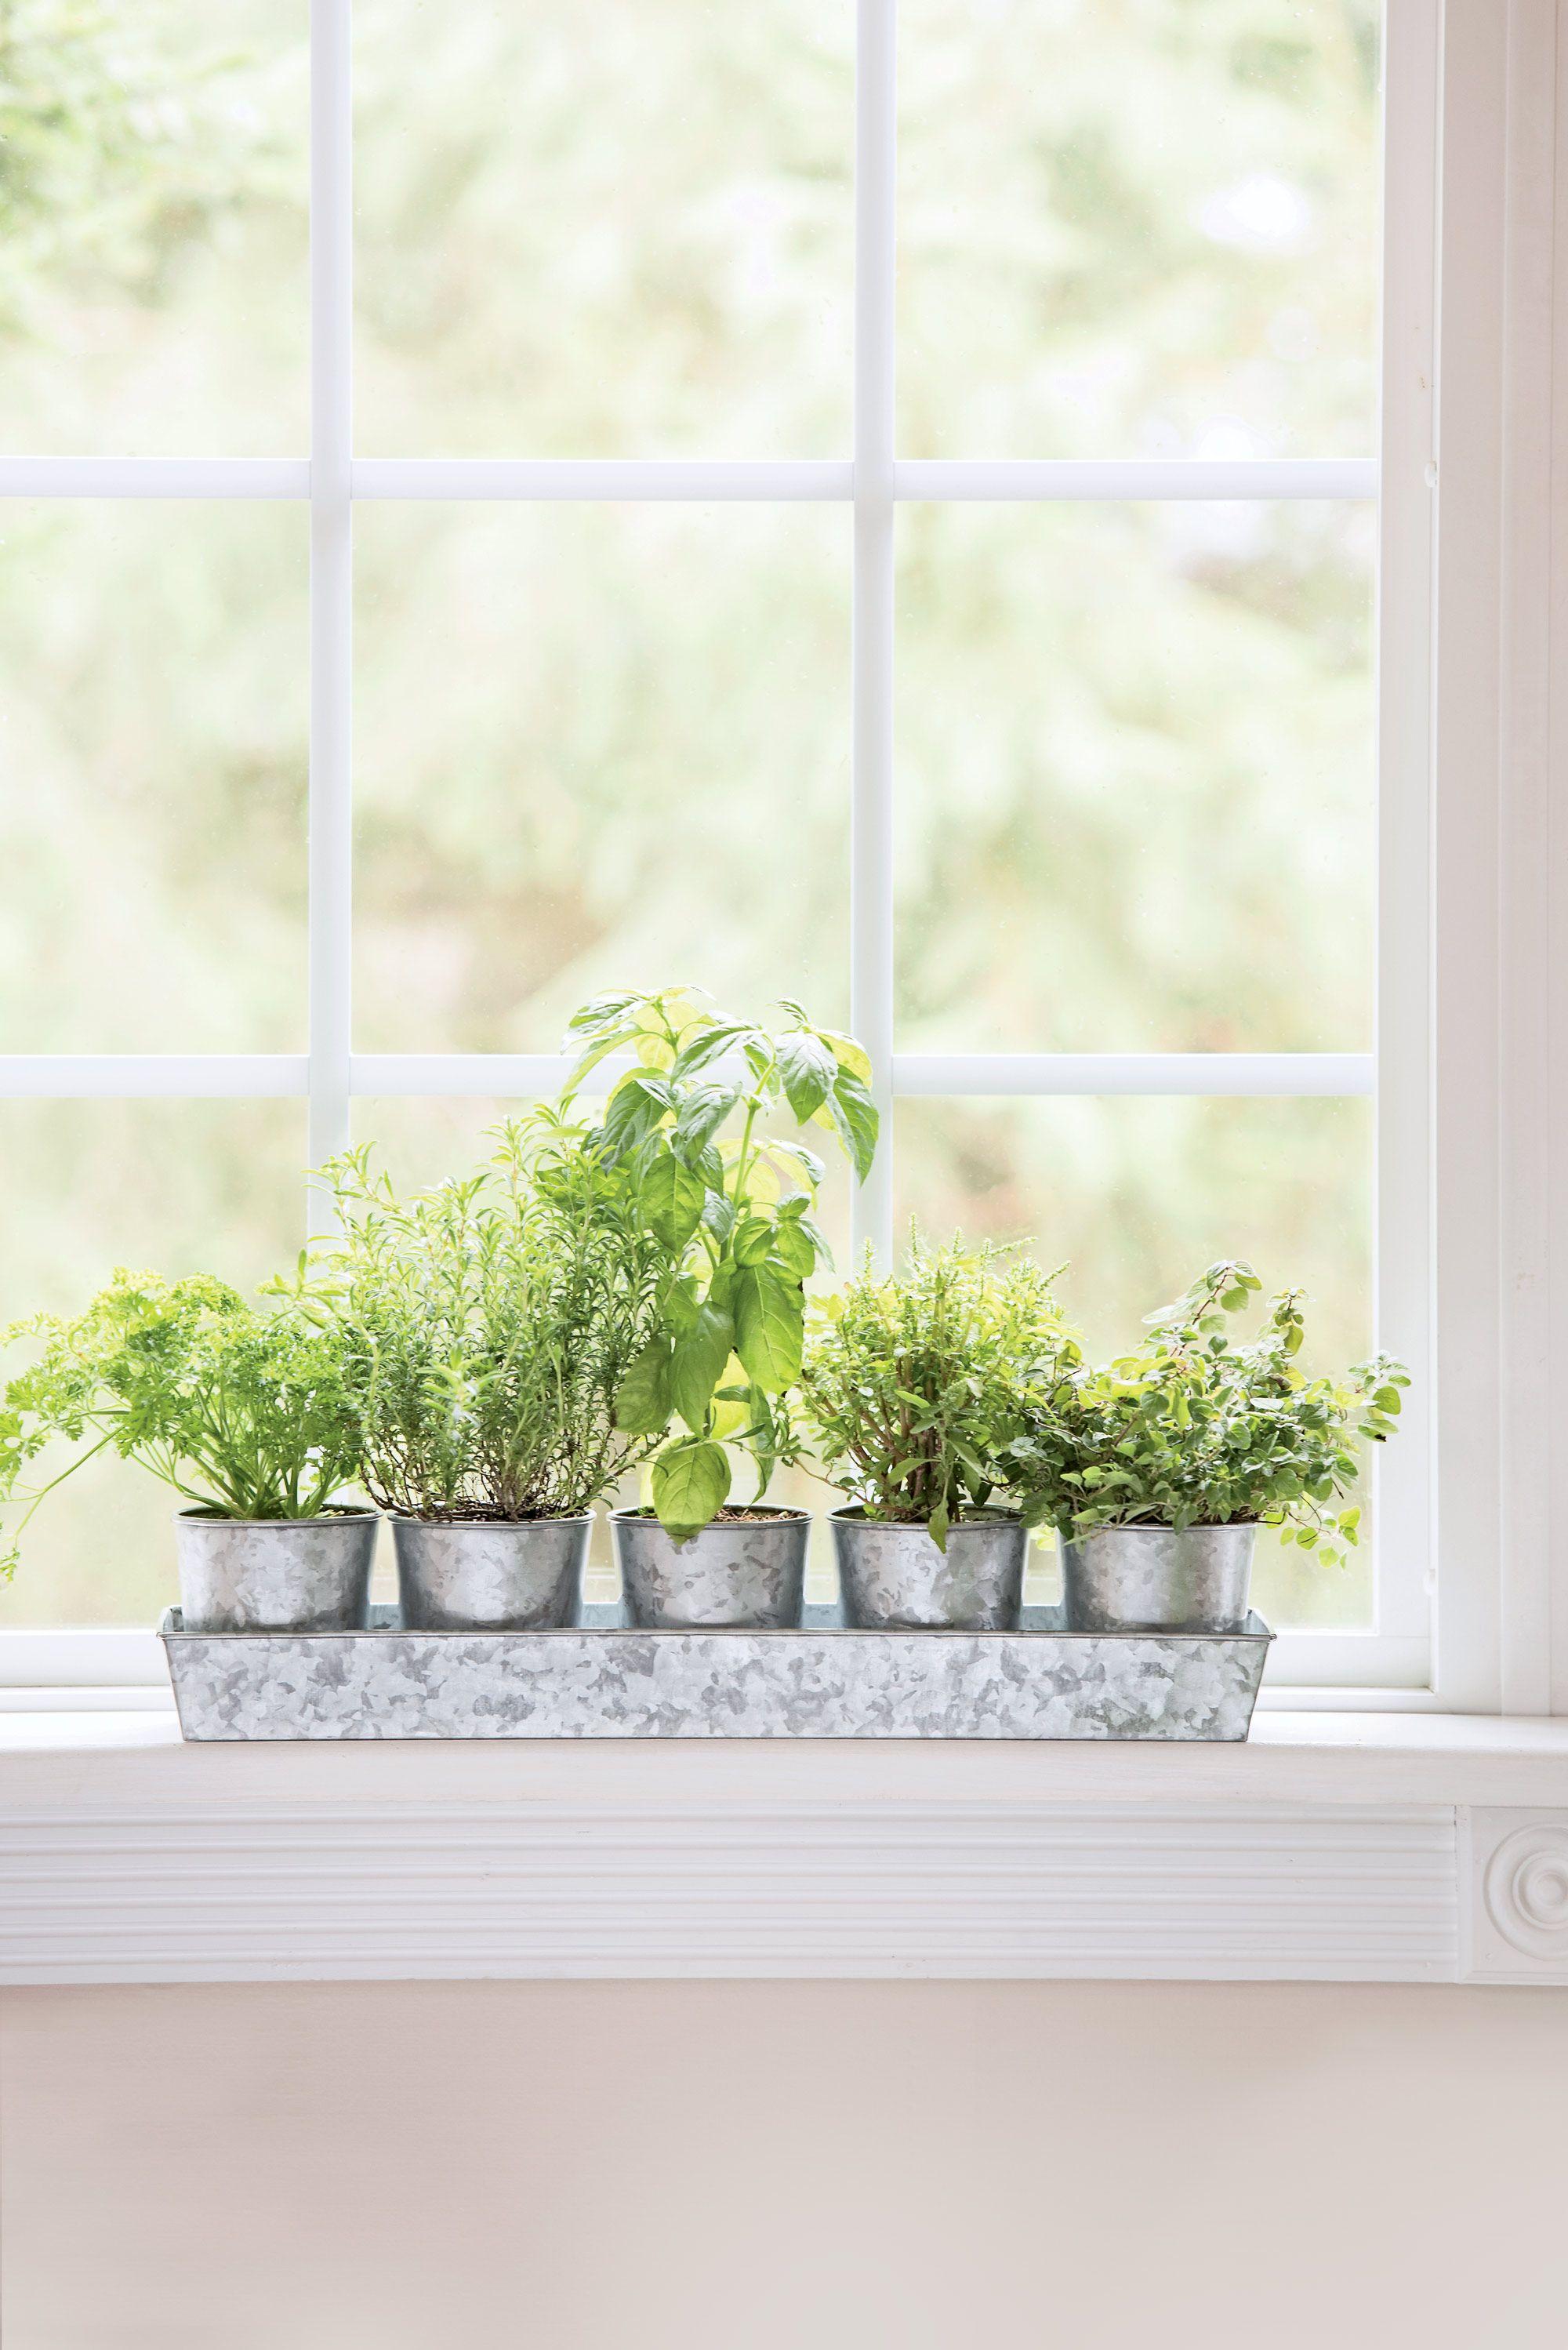 Galvanized Windowsill Herb Planters Tray Gardeners Com In 2020 Herb Planters Herb Garden In Kitchen Herbs Indoors